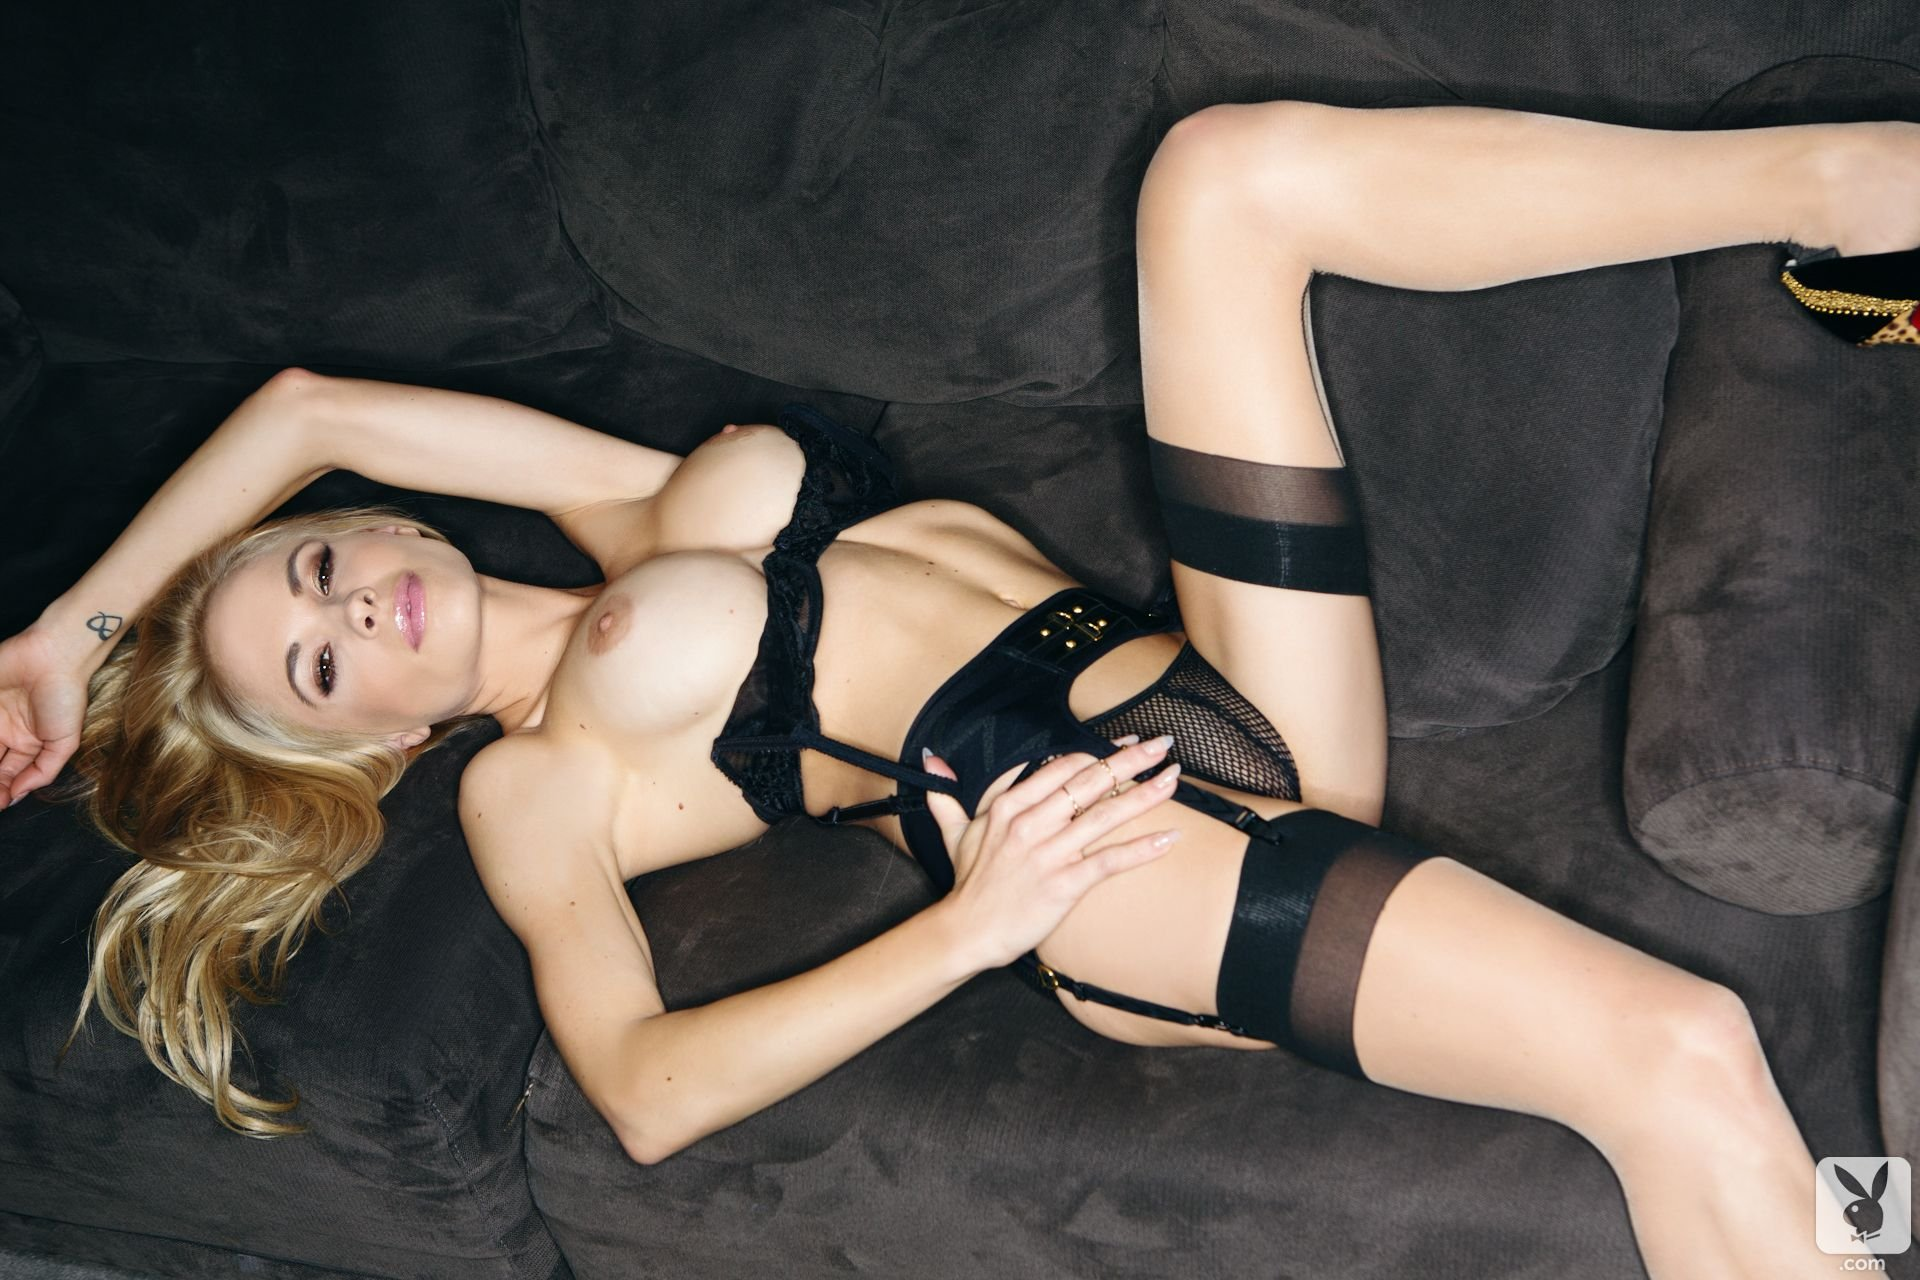 Naked photos of alexa lorans